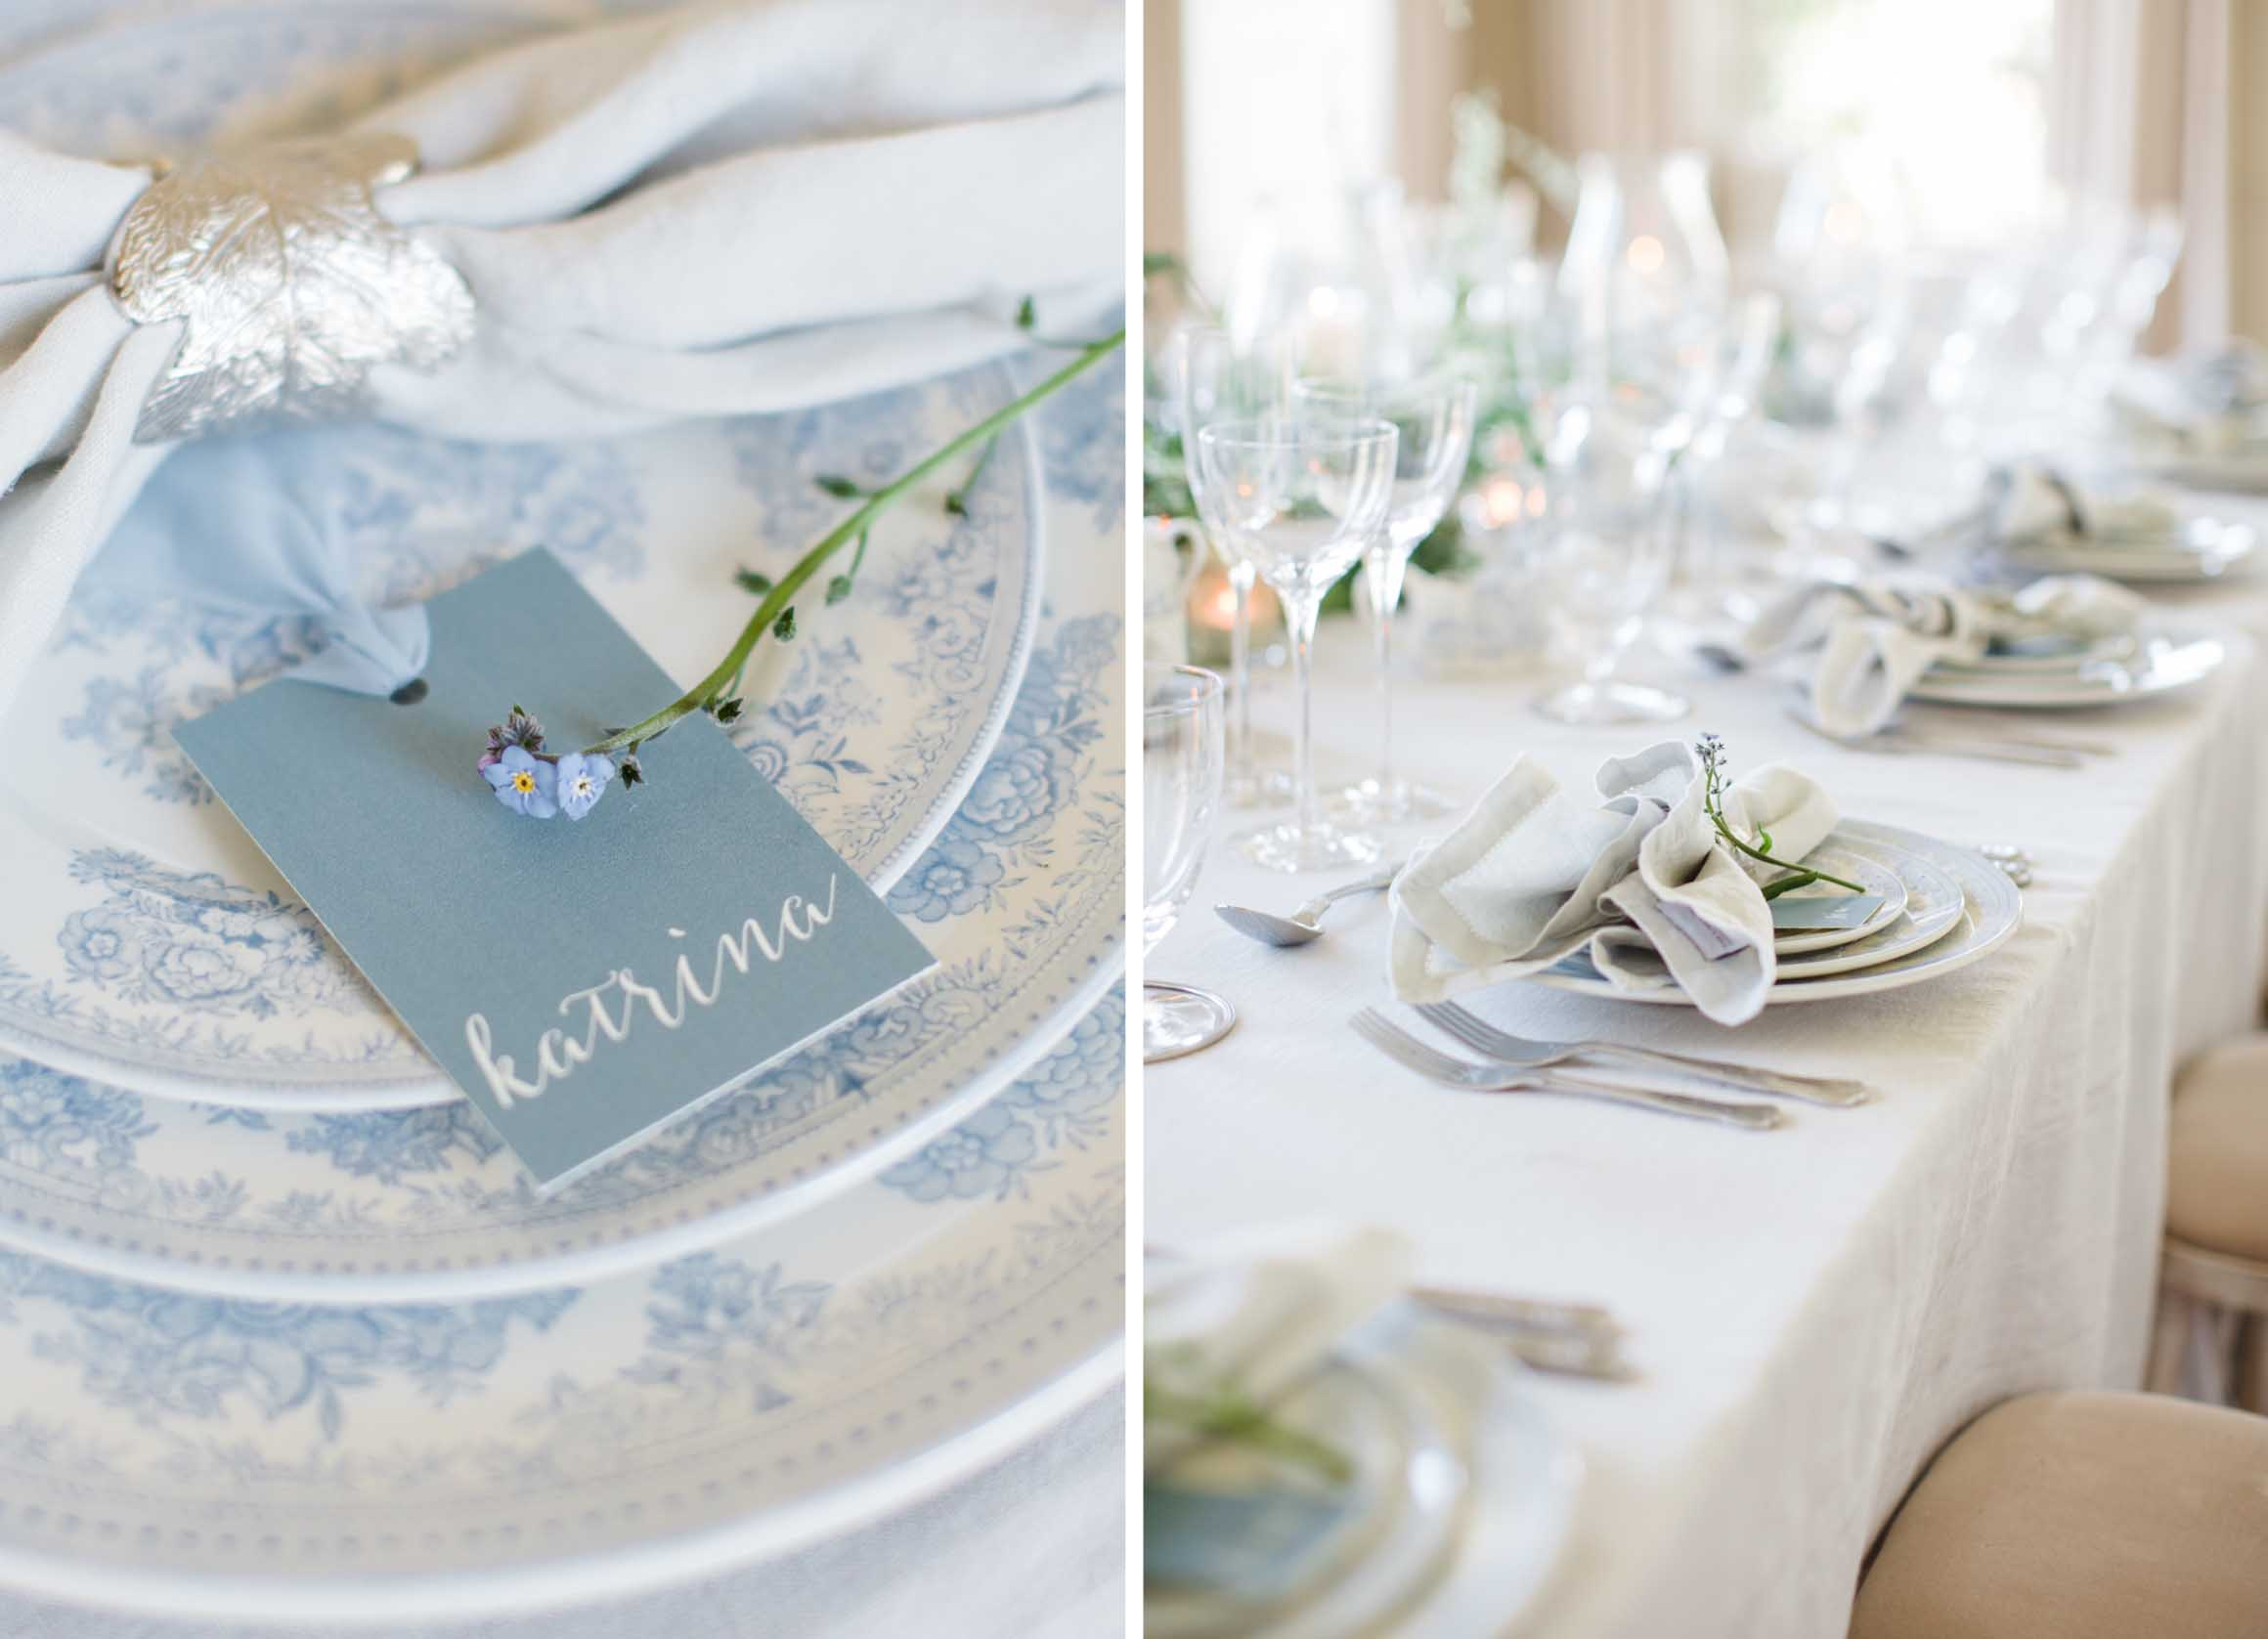 Pynes House Wedding- Amy O'Boyle Photography 3.jpg